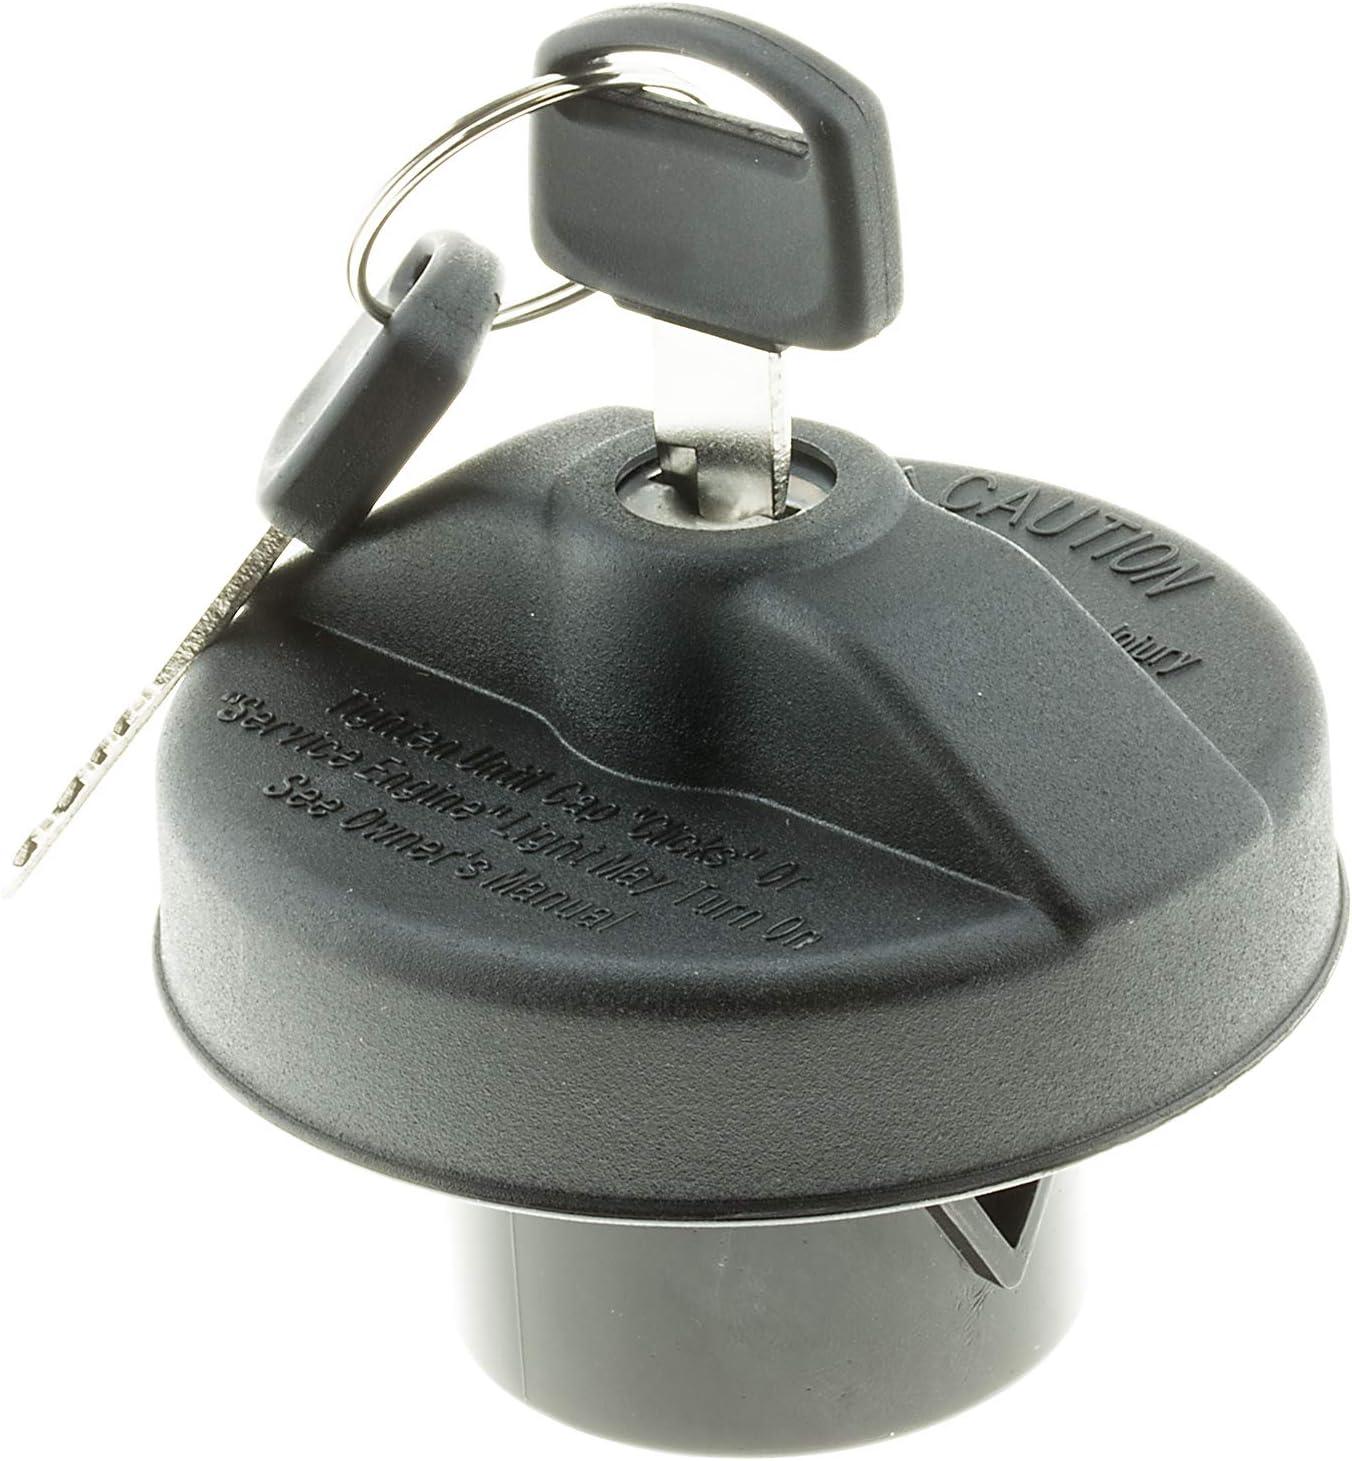 MotoRad MGC804 Locking Fuel Cap | Fits Select Buick, Cadillac, Chevrolet, GMC, Oldsmobile, Pontiac, Saturn Applications